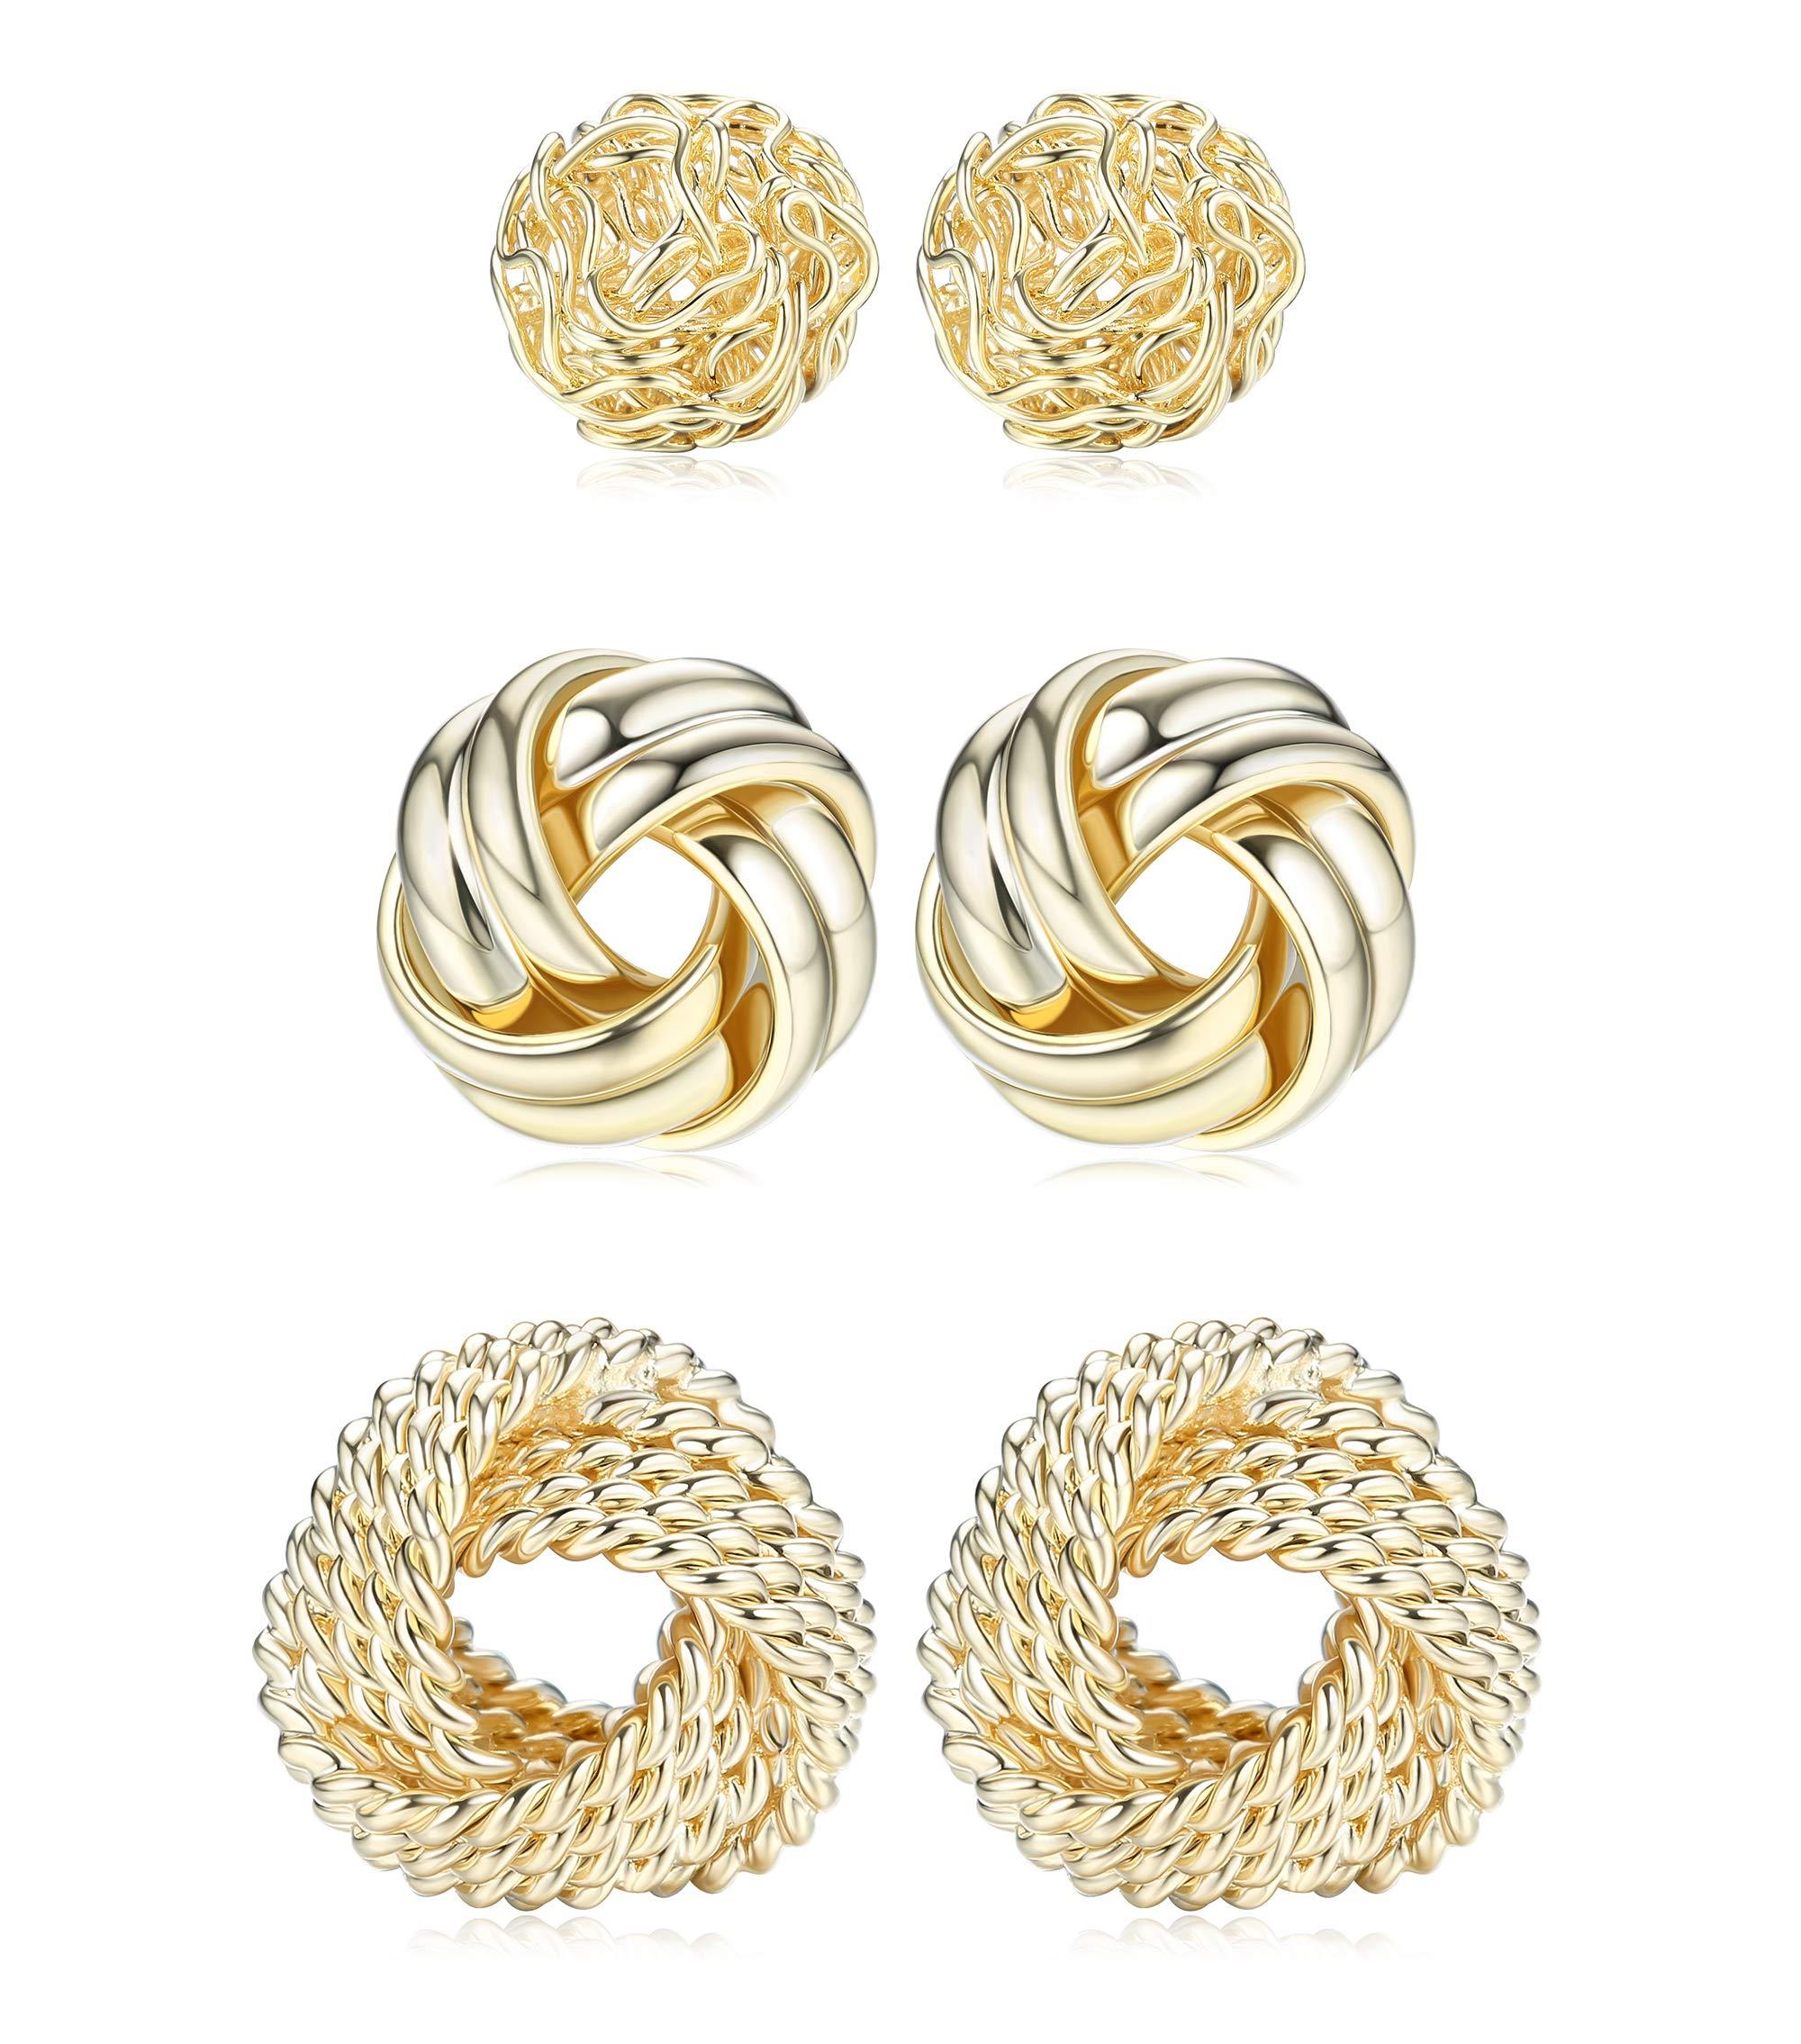 FIBO STEEL 3 Pairs Gold Love Knot Earrings For Women Men 14K Gold Plated Woven Ball Stud Earrings Simple Post earrings For Women